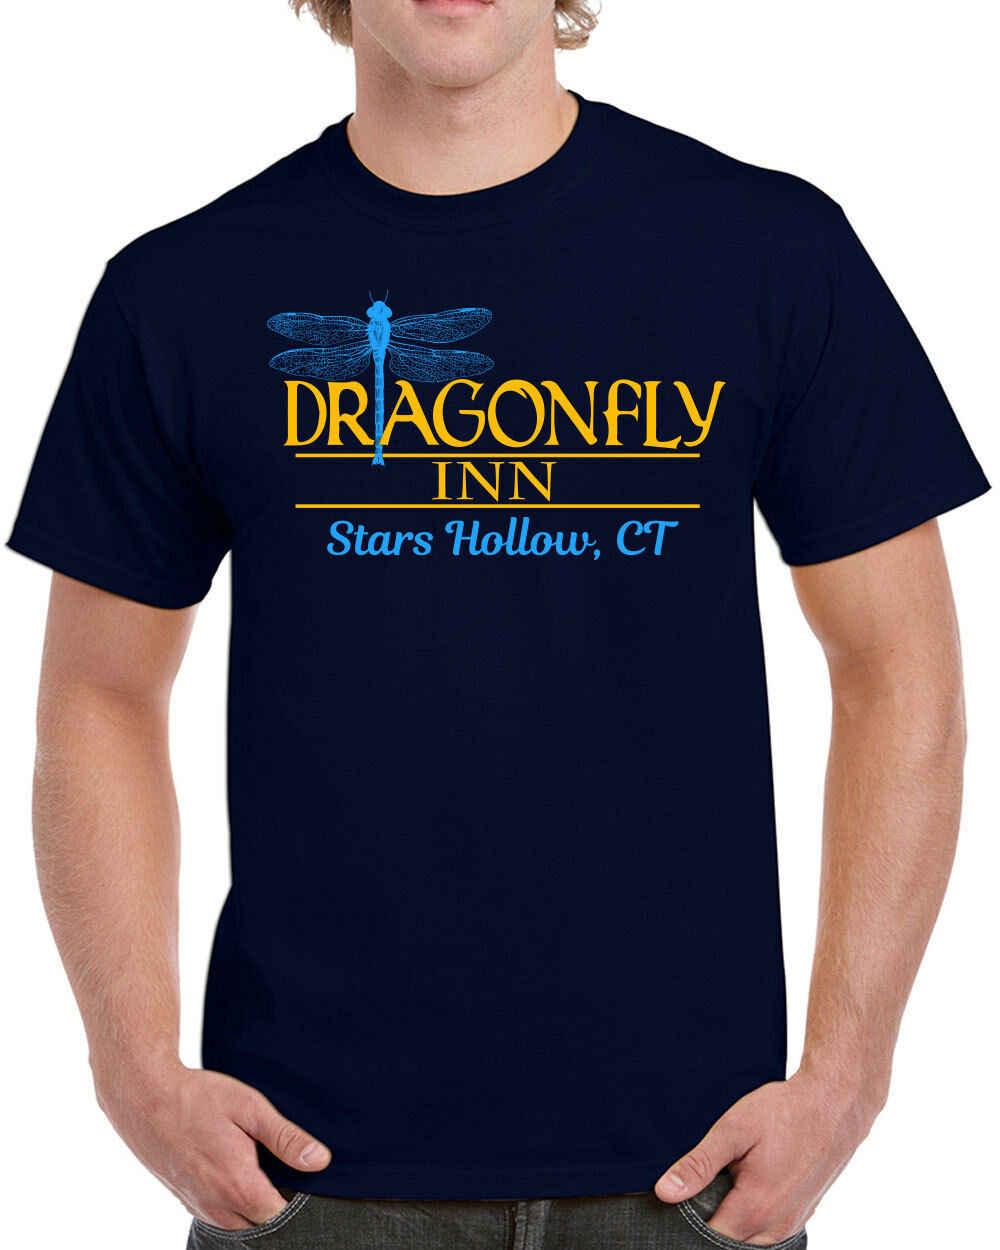 559 Dragonfly Inn mens T-Shirt gilmore tv show girls costume divertente lukes diner A Buon Mercato all'ingrosso tees, 100% Cotone Per L'uomo